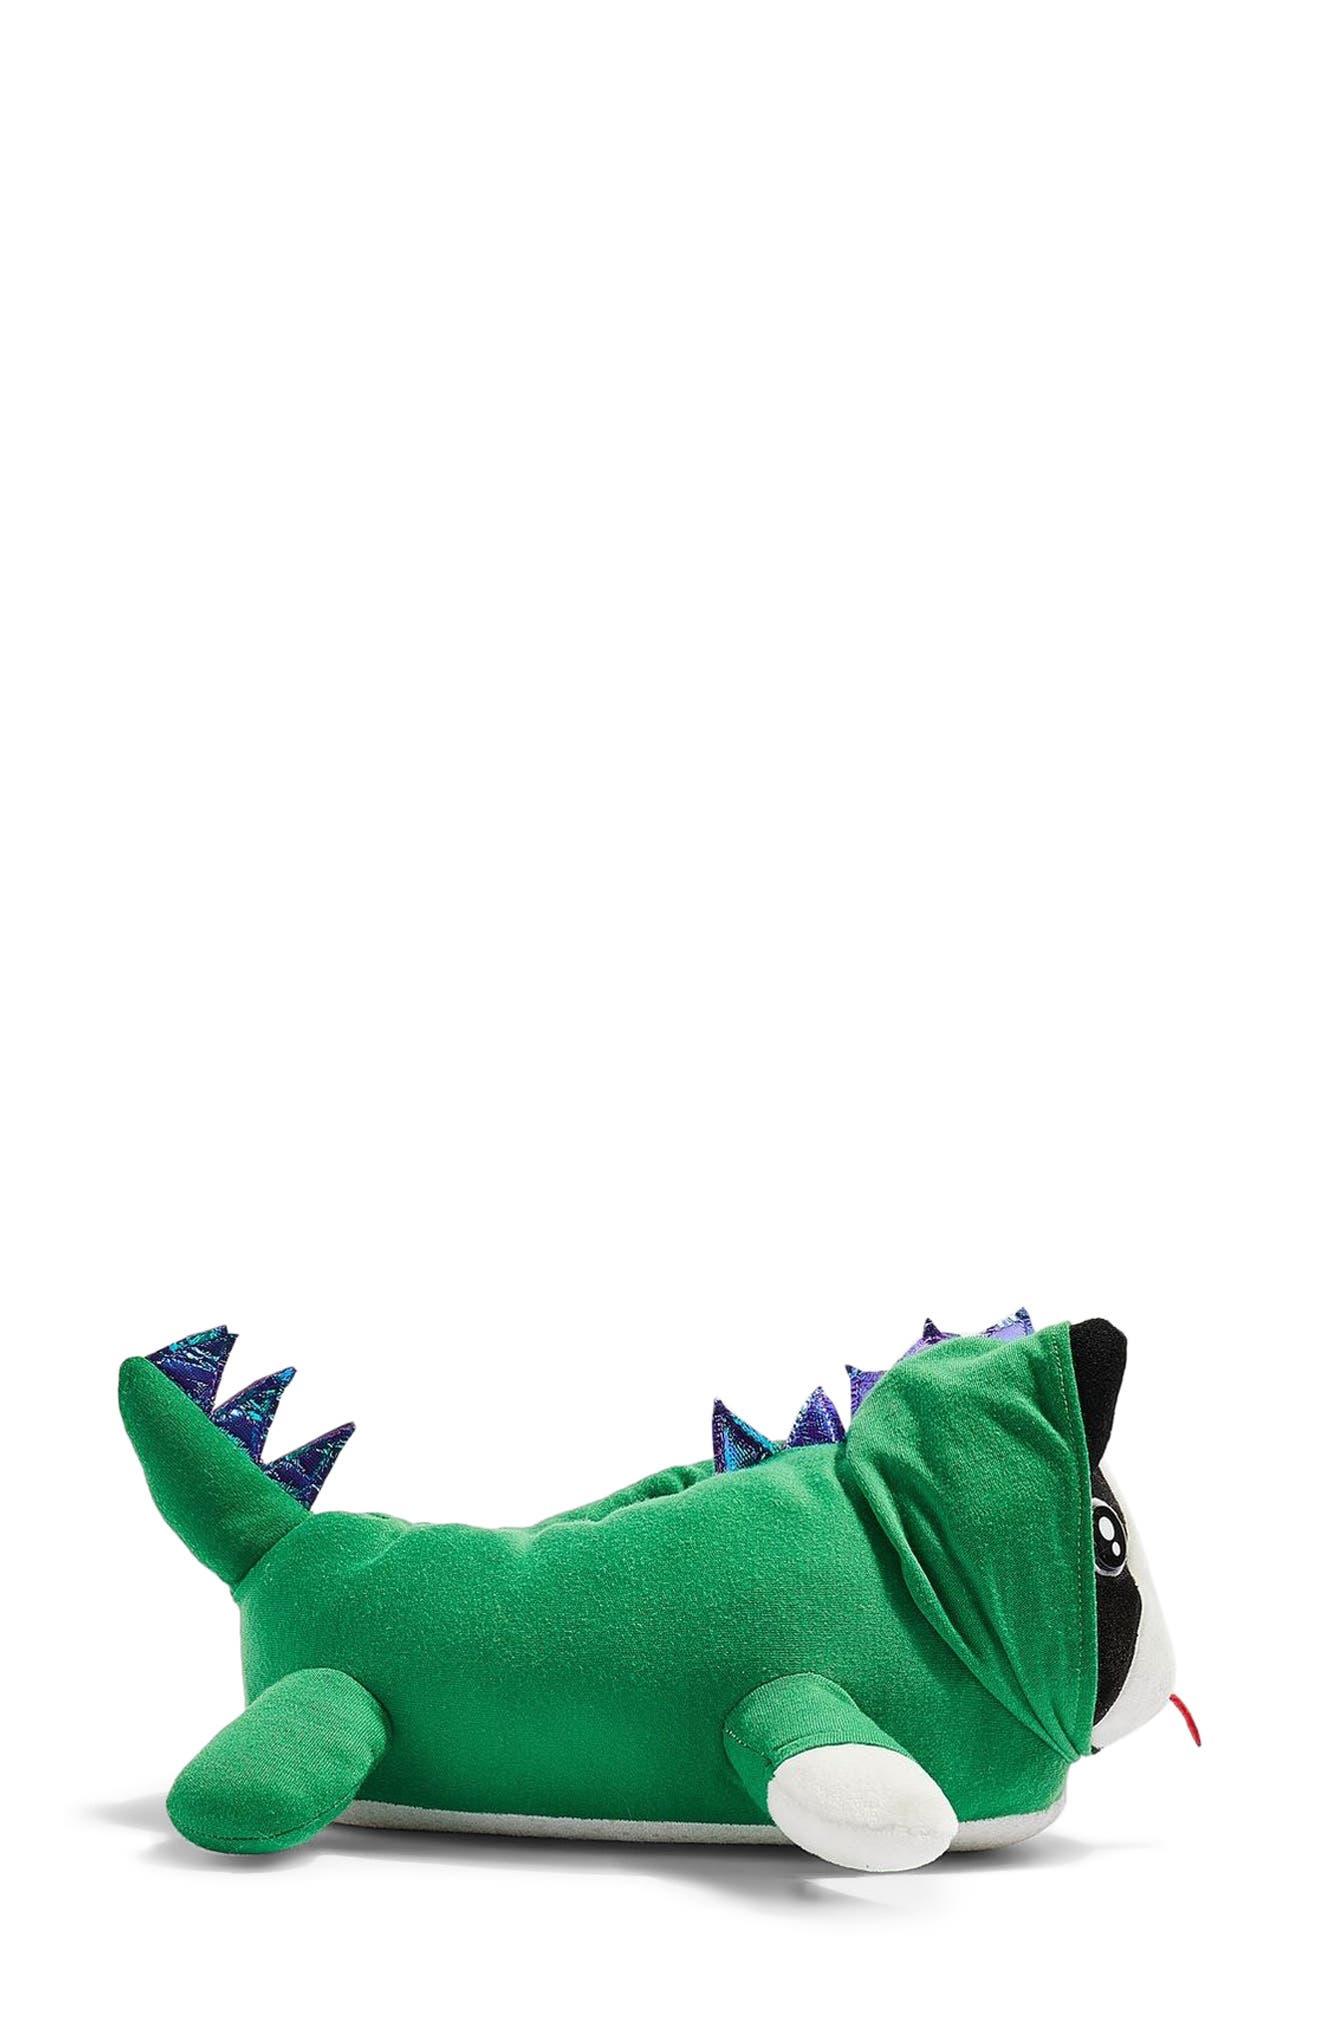 Dino Dog Slippers,                             Alternate thumbnail 3, color,                             300